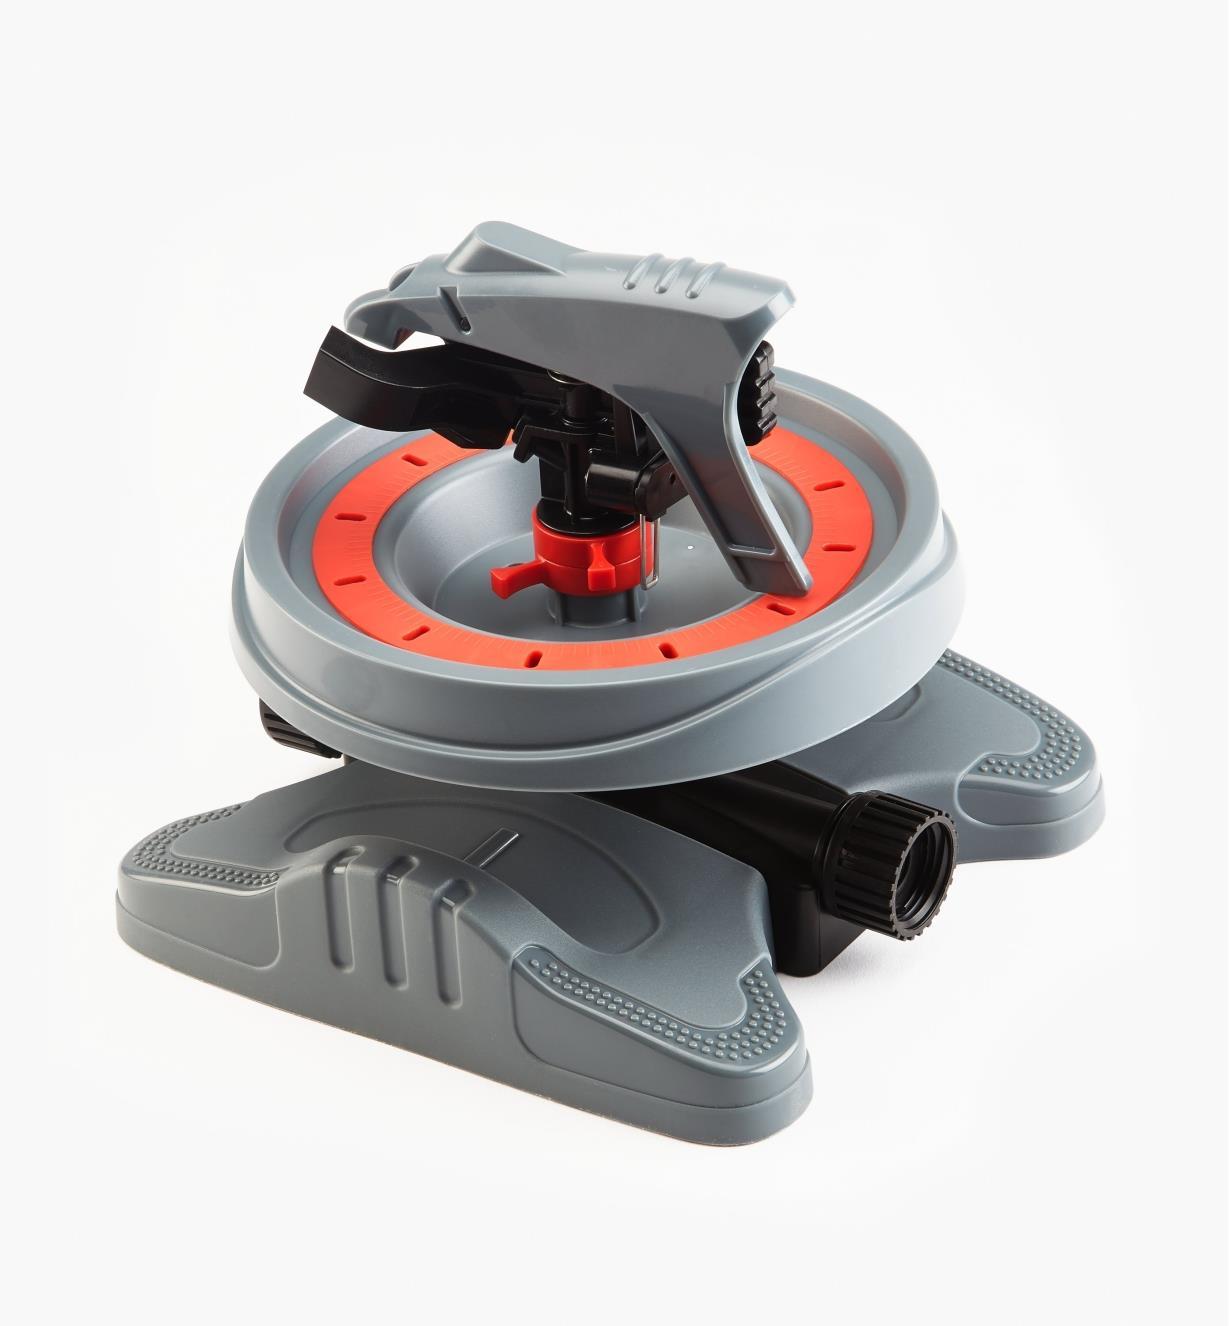 AB173 - Contour Sprinkler